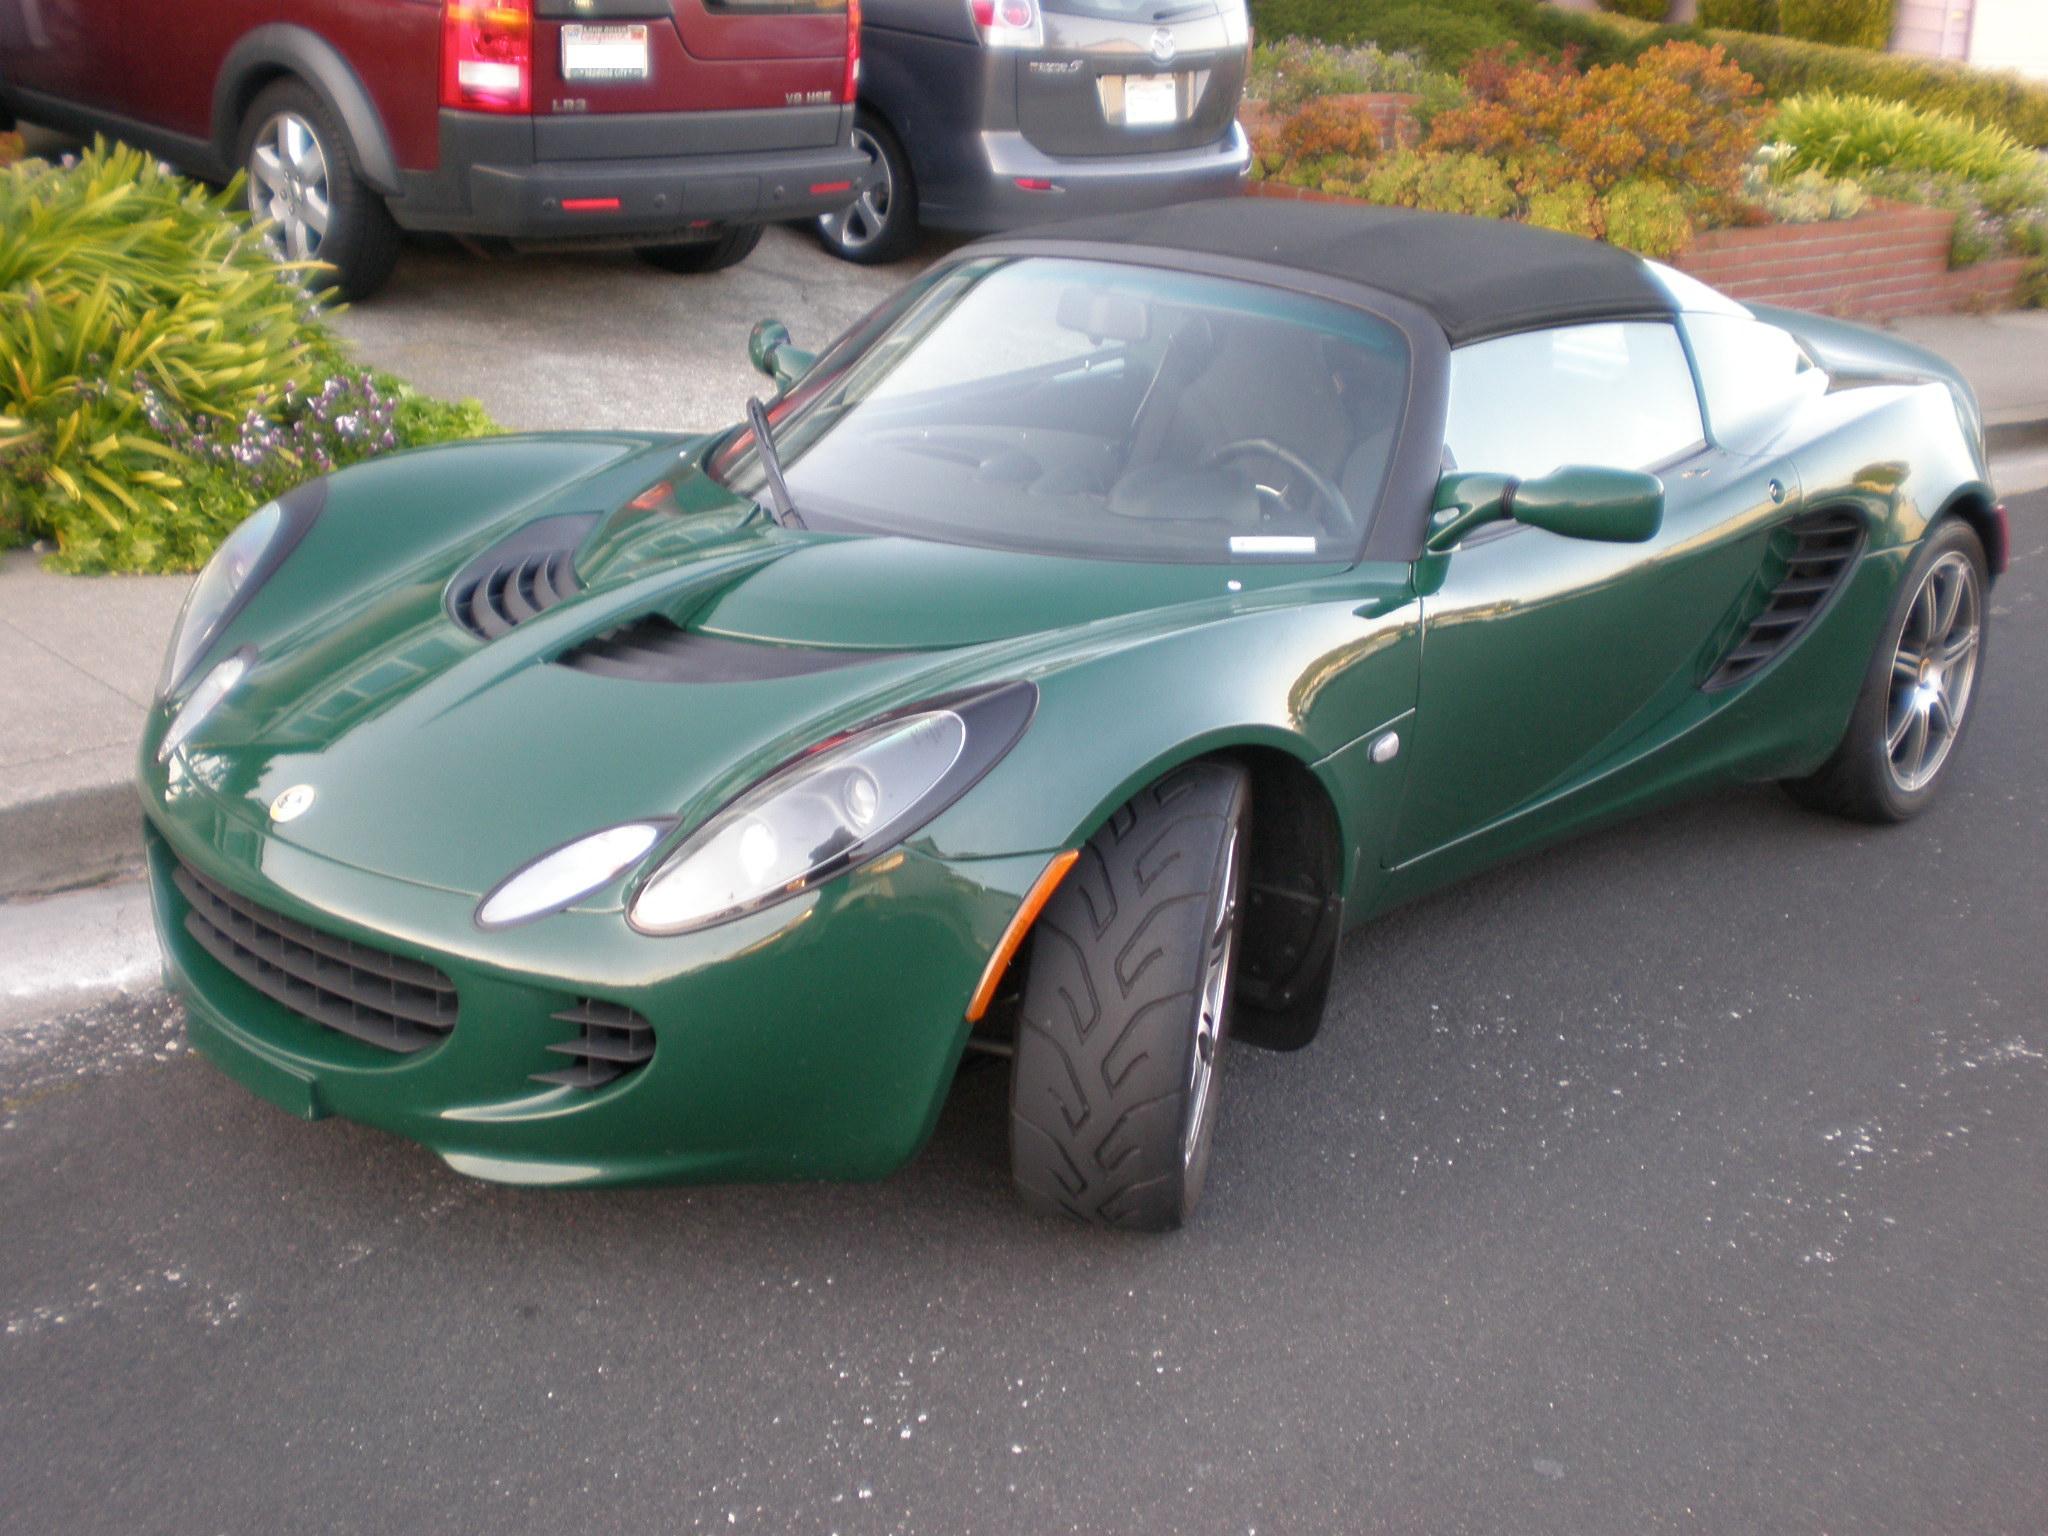 Description Green Lotus Elise Series 2 side 1.JPG